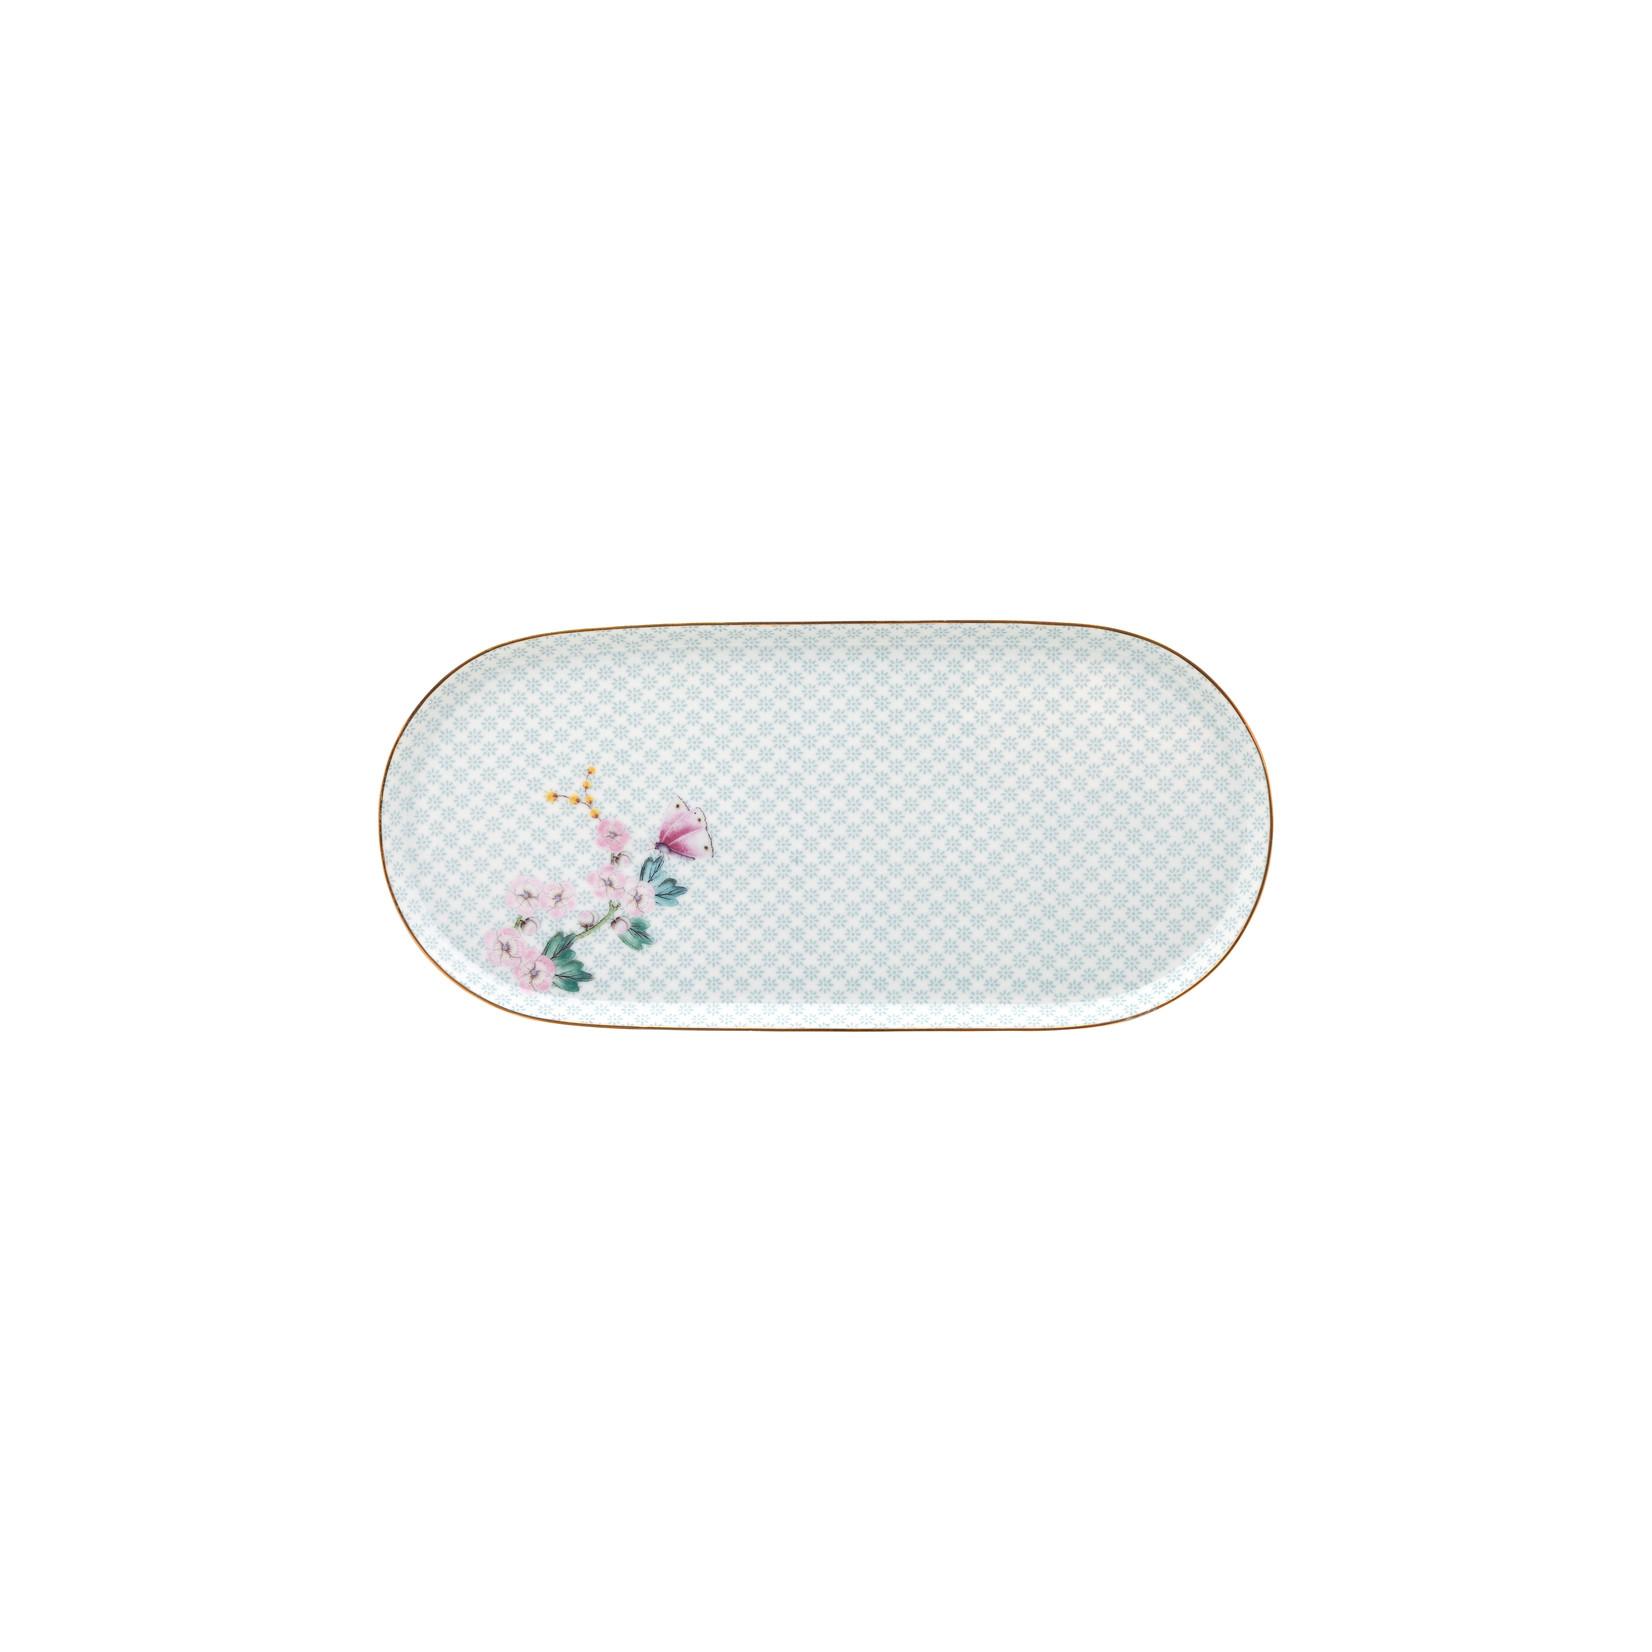 PIP Studio Plate Sugar & Creamer Kamini White 25x12cm